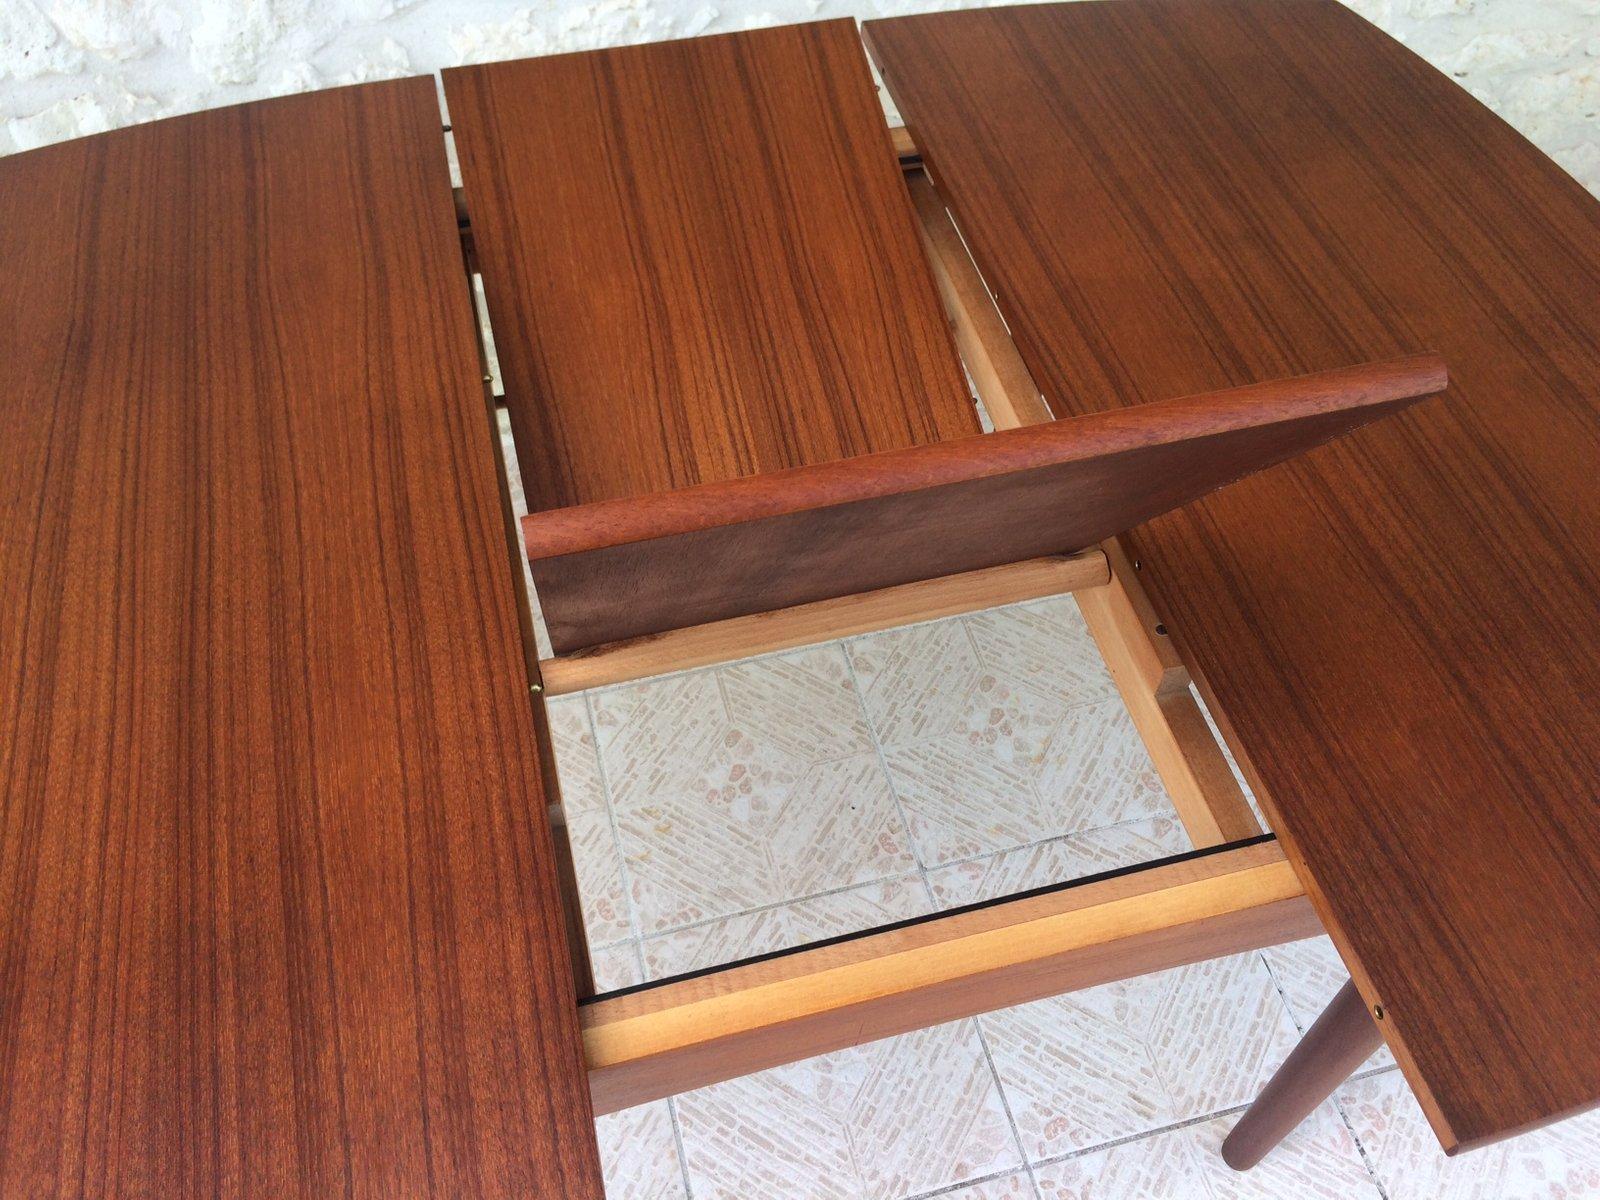 Extendable Scandinavian Teak Dining Table With Hidden